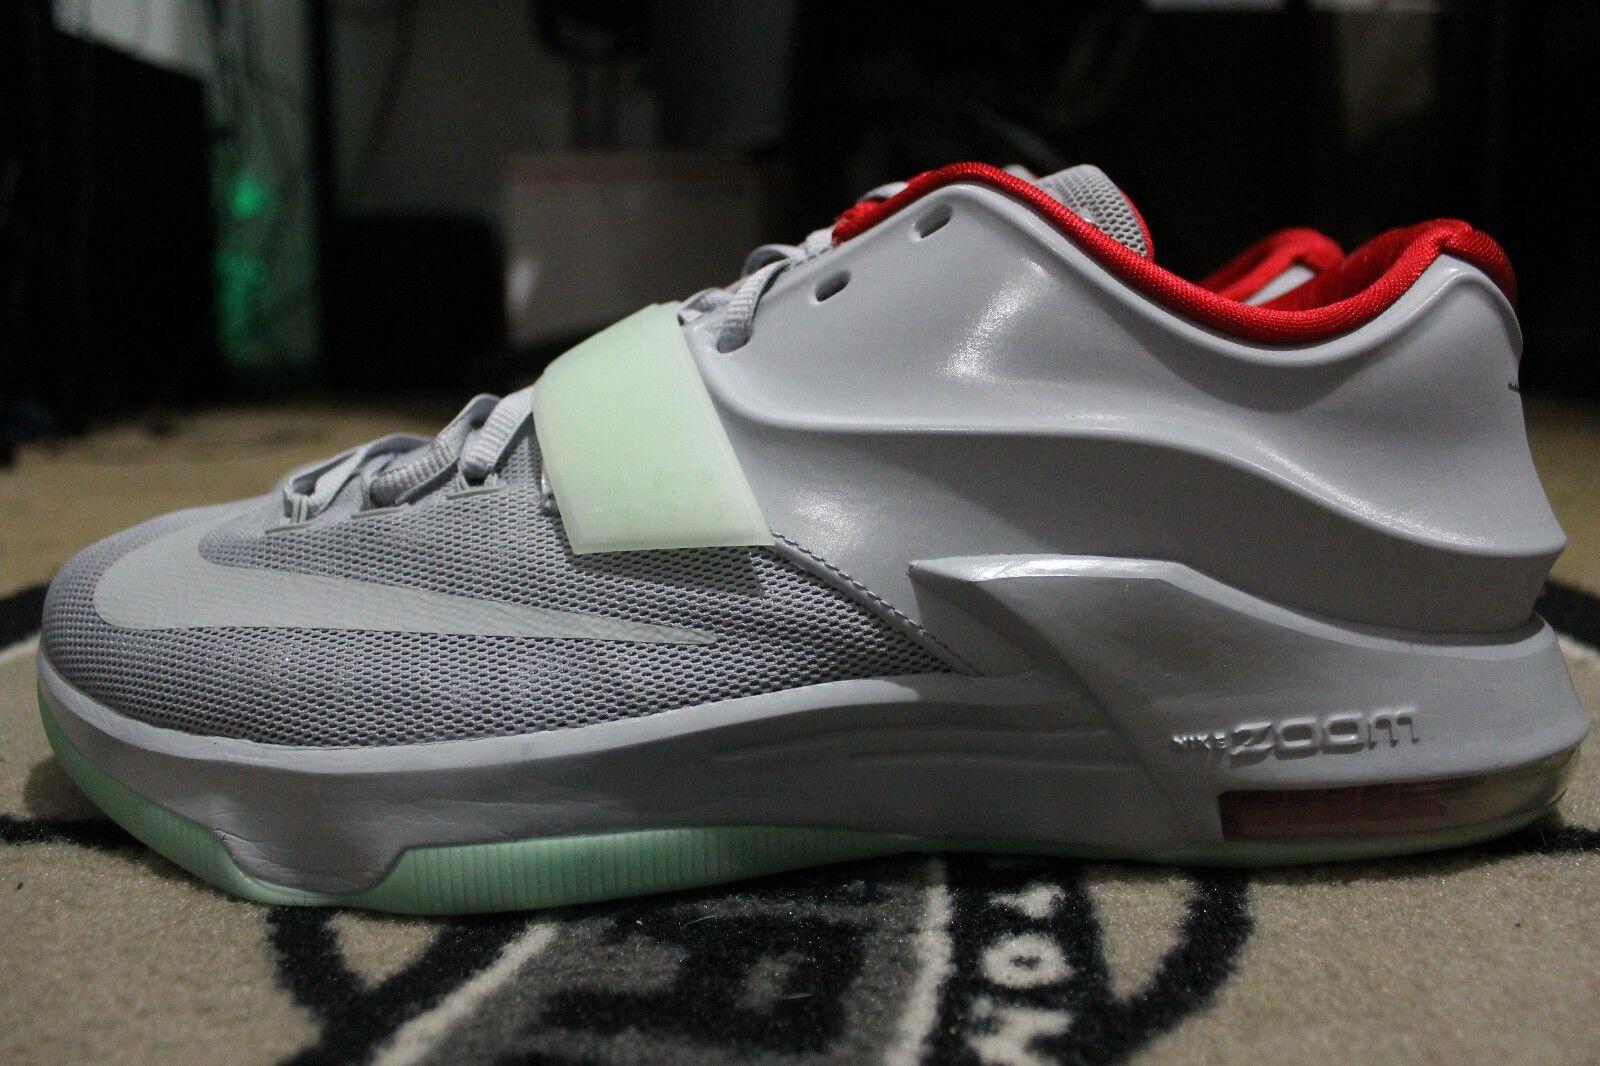 Nuove nike kd 7 nikeid yeezy platinum gray rosso verde taglia.